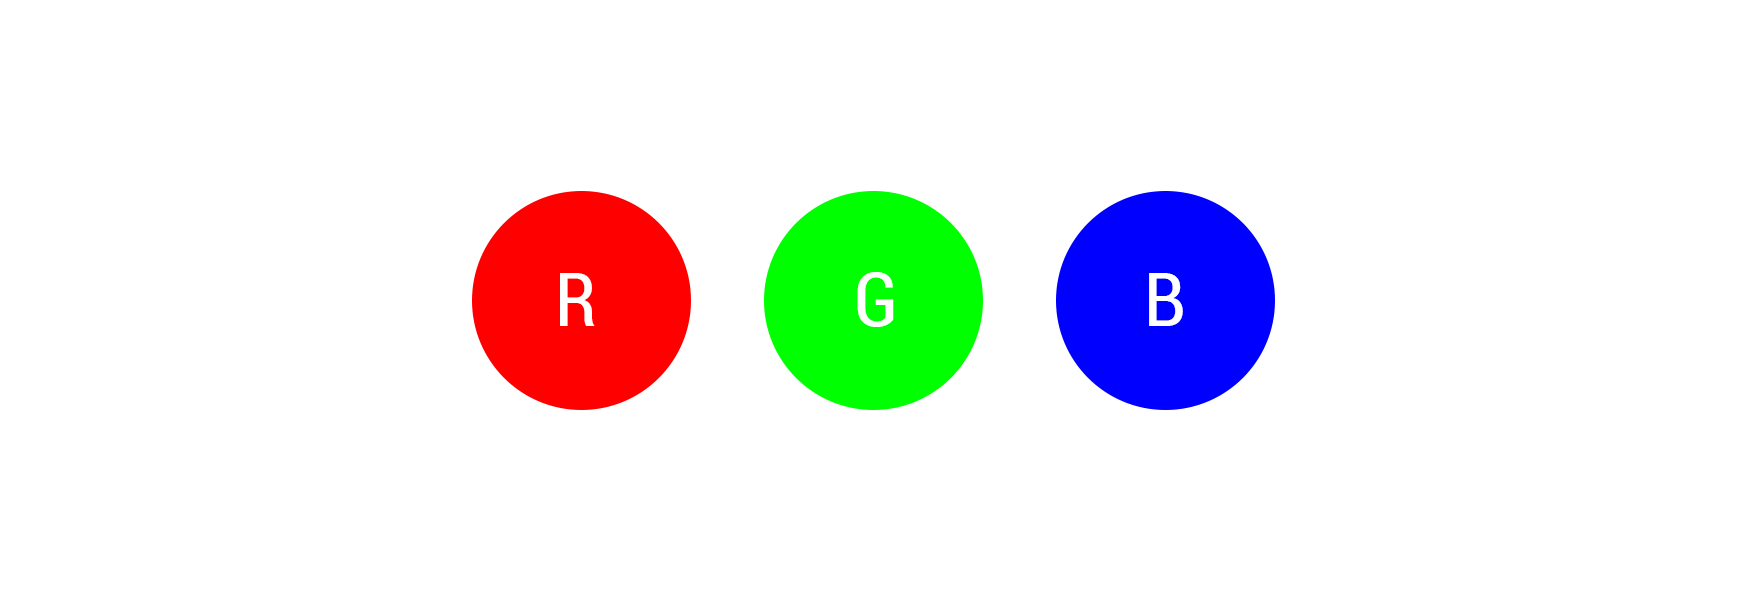 Designagentur-Stuttgart-Kreativbetrieb-Design-Lexikon-RGB-1